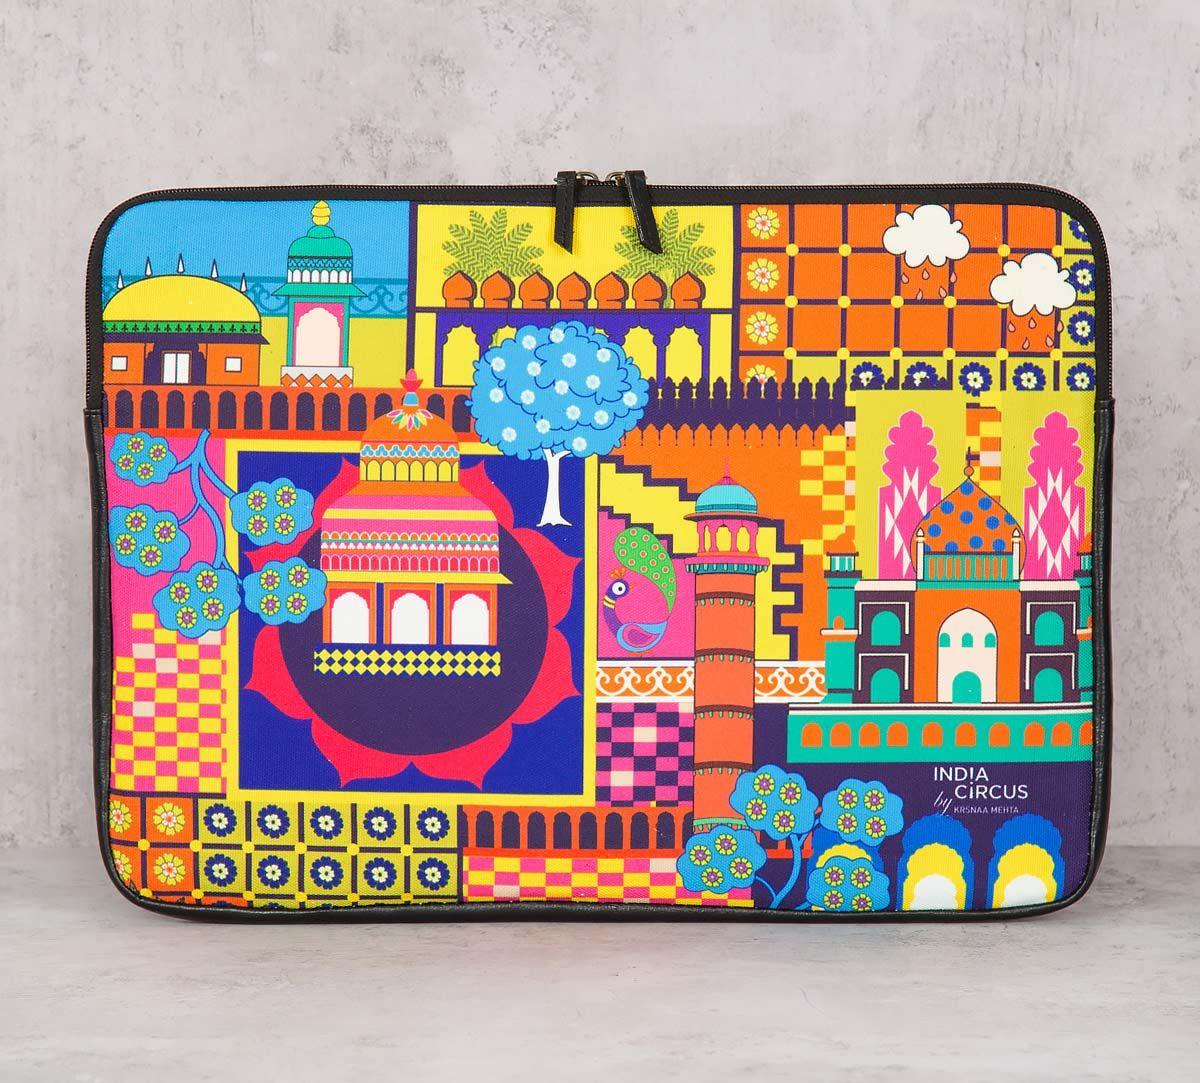 India Circus City Resonance Laptop Sleeve